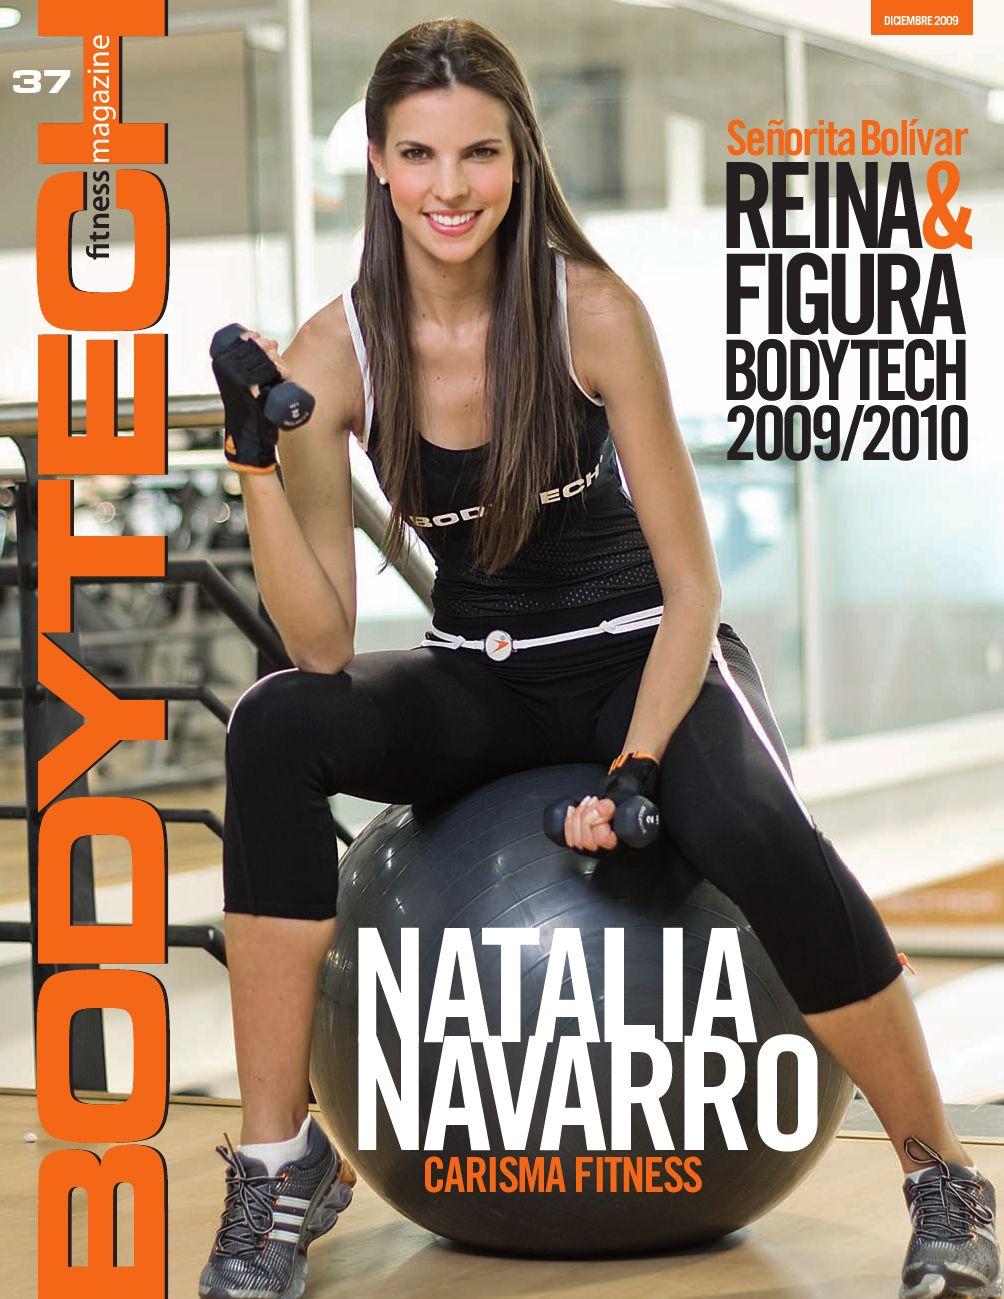 37 bodytech fitness magazine by bodytech fitness magazine issuu. Black Bedroom Furniture Sets. Home Design Ideas